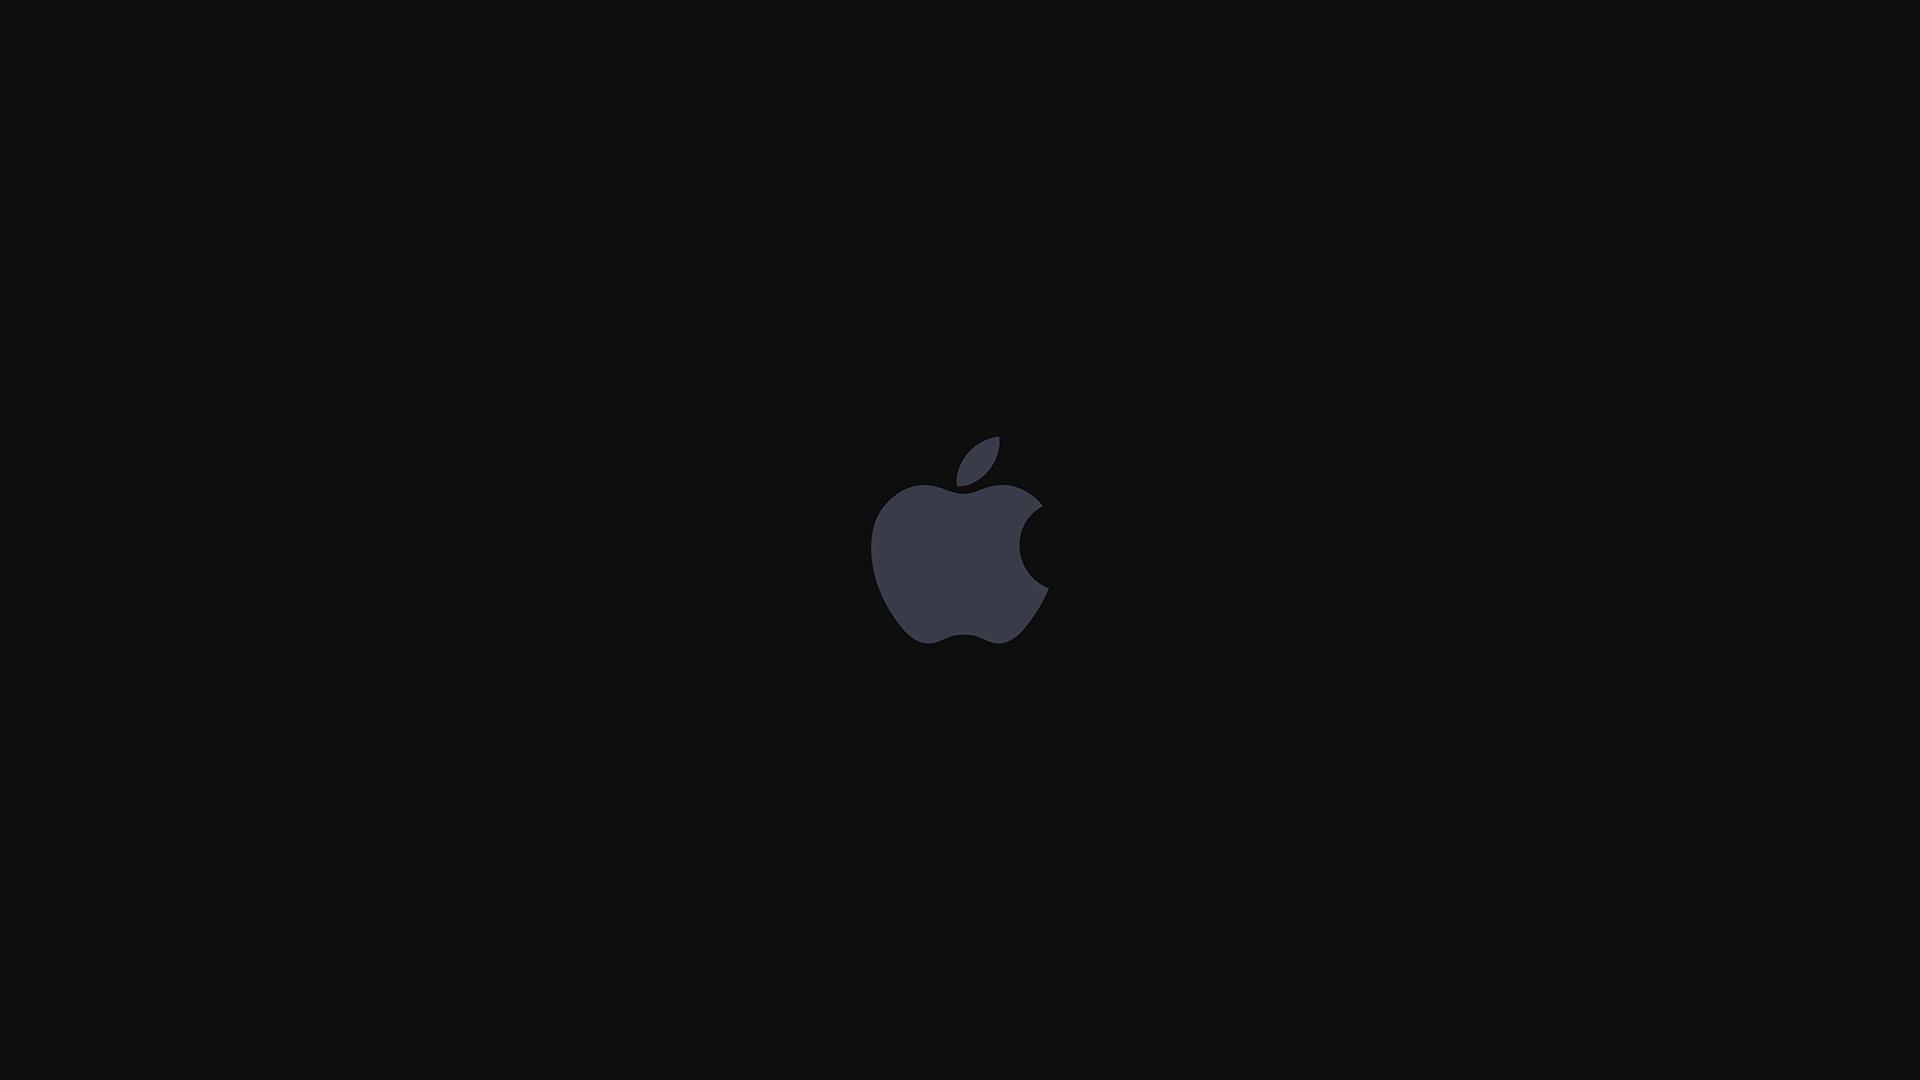 Fall Mobile Pattern Wallpapers As68 Iphone7 Apple Logo Dark Art Illustration Wallpaper